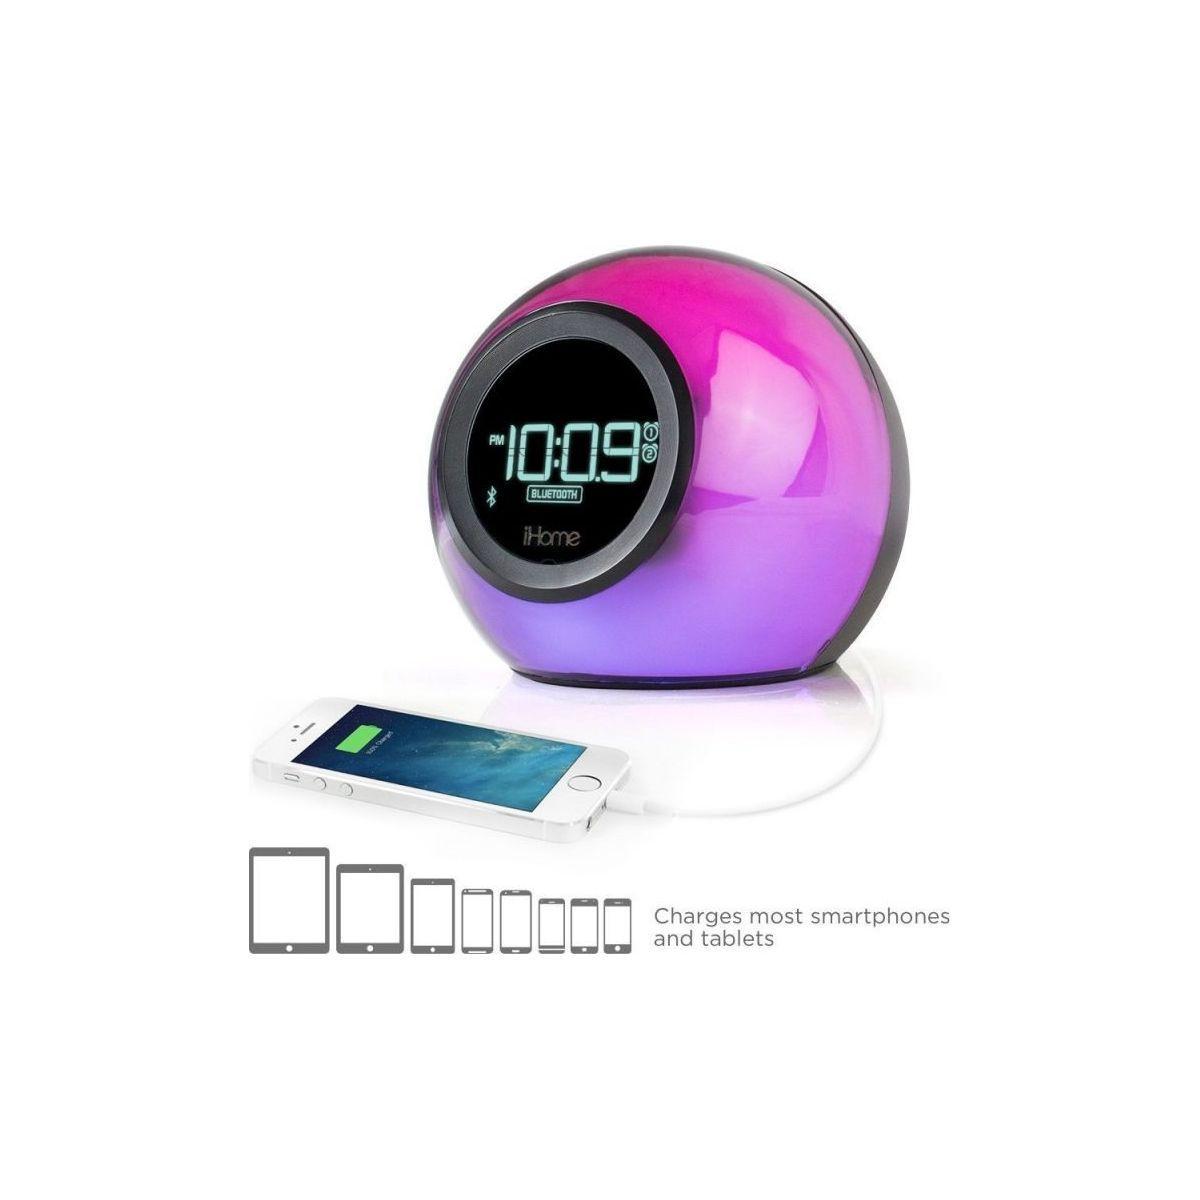 Radio-r�veil ihome ibt29 bluetooth color changing - livraison offerte : code liv